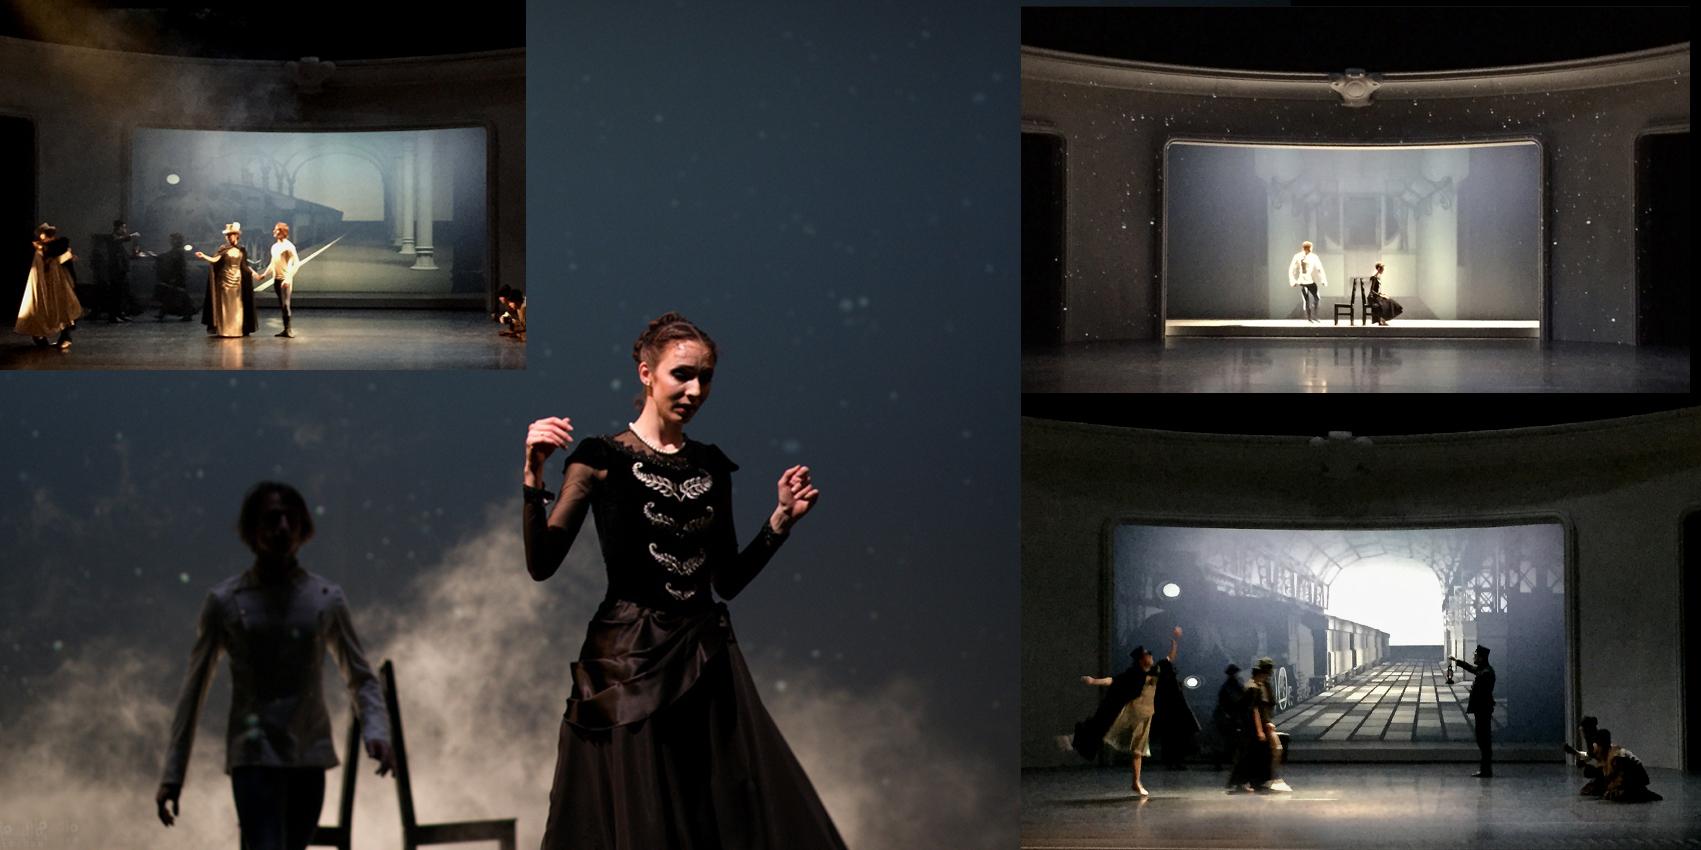 Anna Karenina, Ballett von Tomasz Kajdanski, Teatr Wielki, Poznan, Polen